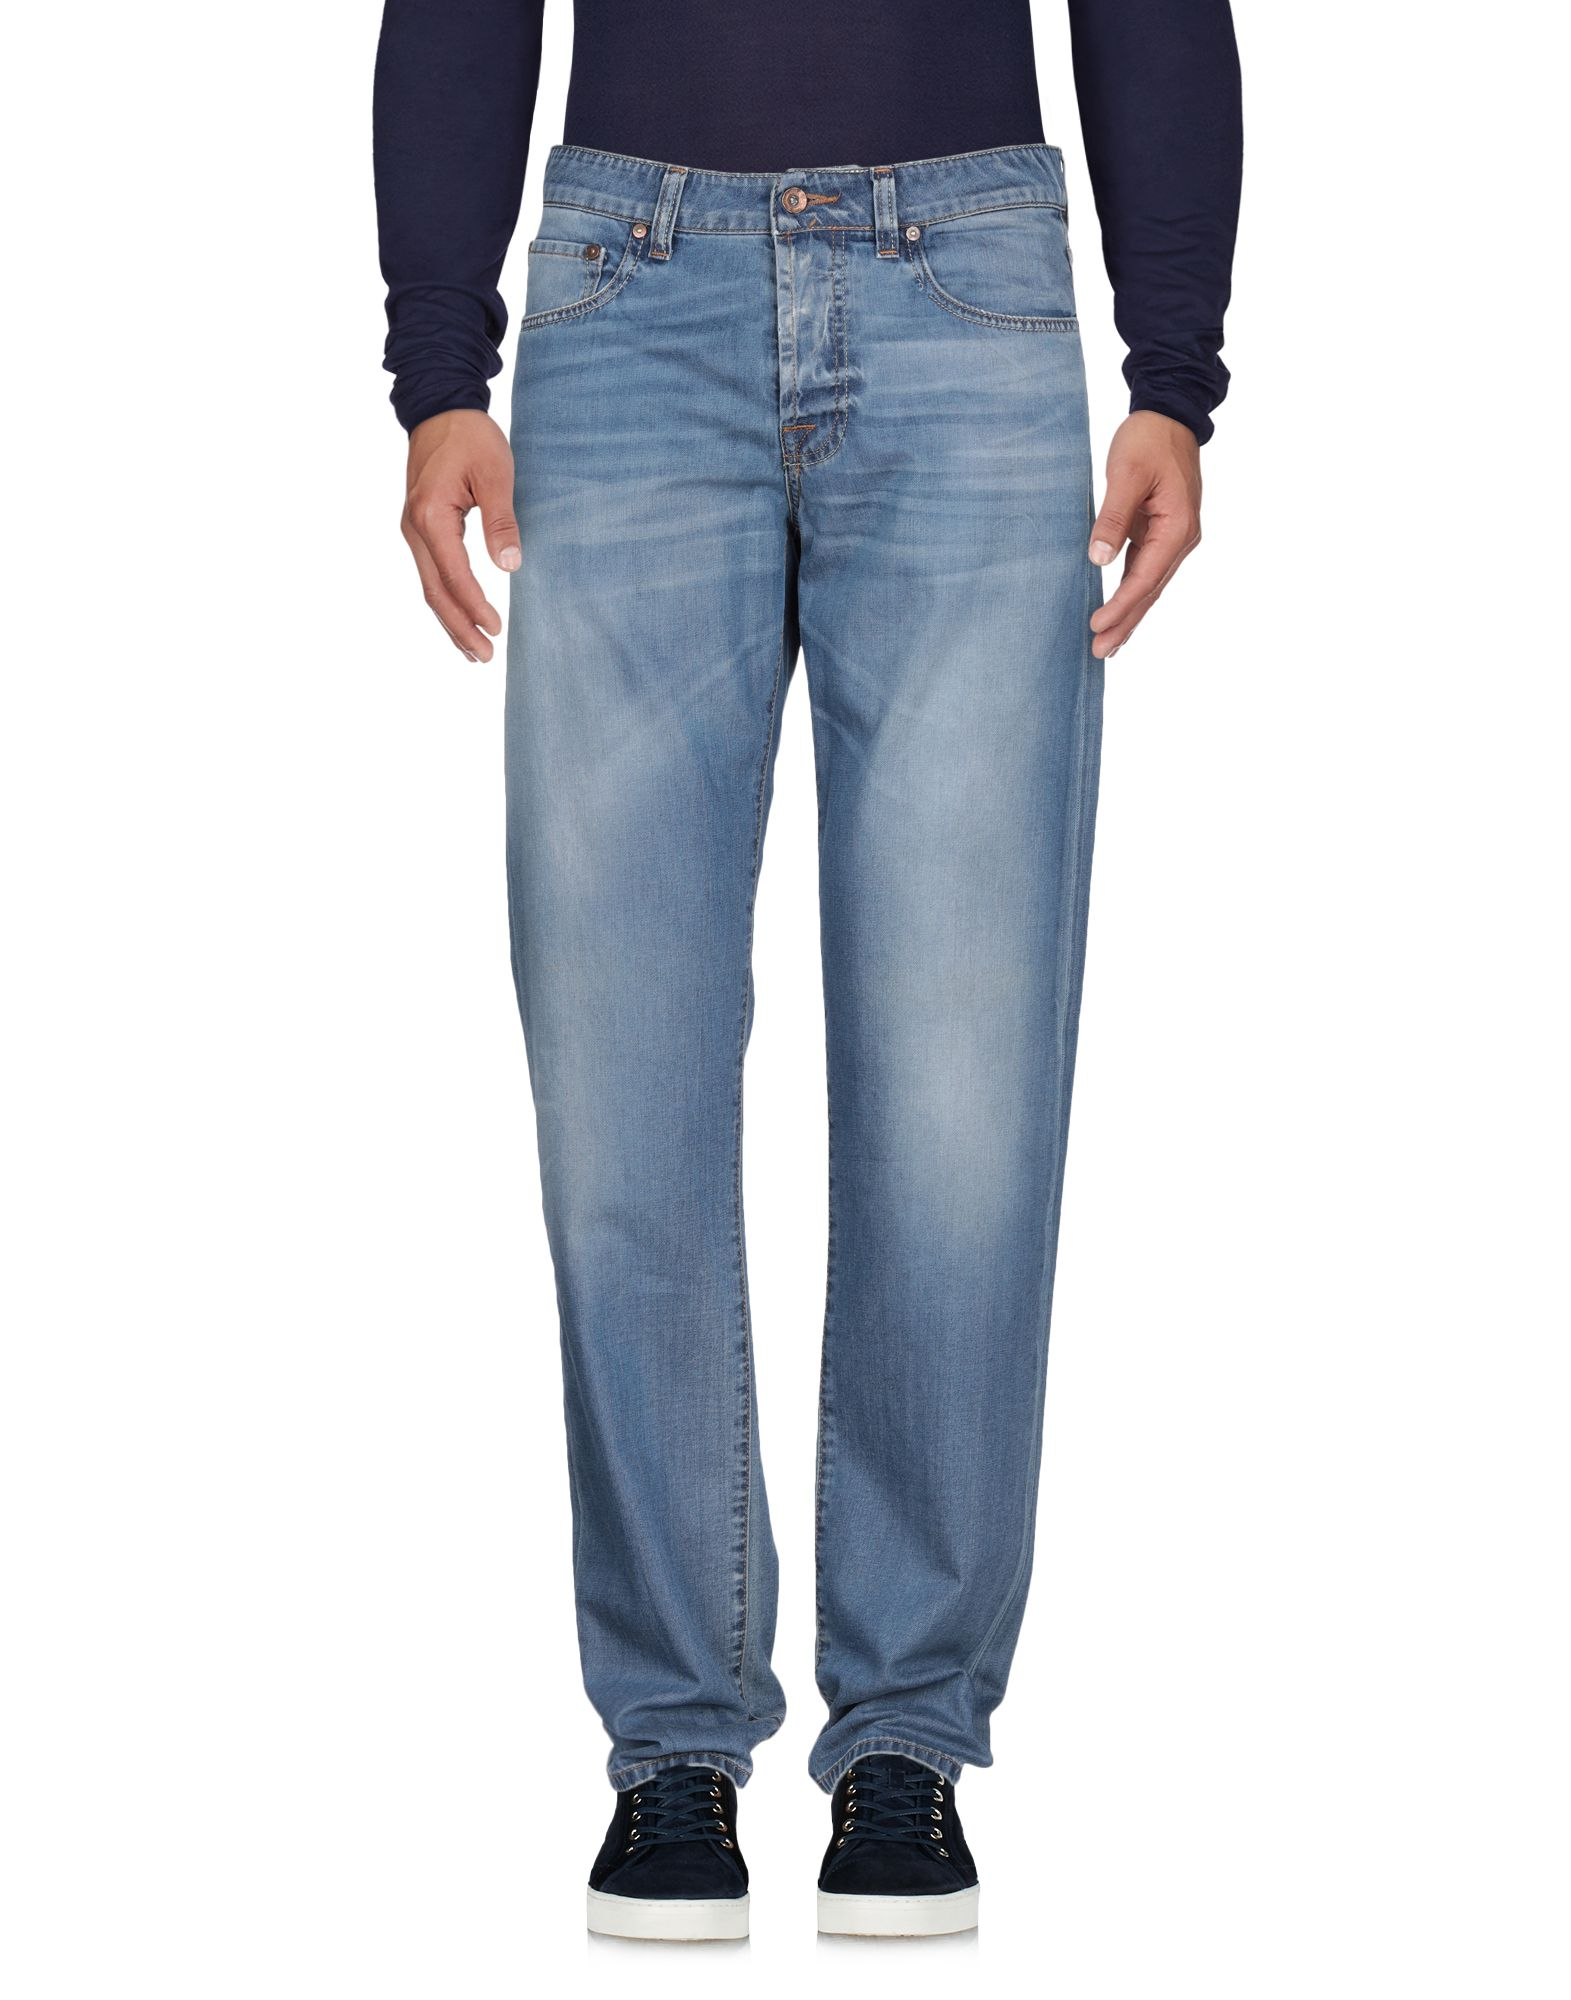 Pantaloni Jeans Uomo Pt05 Uomo Jeans - 42685298IC ac5983